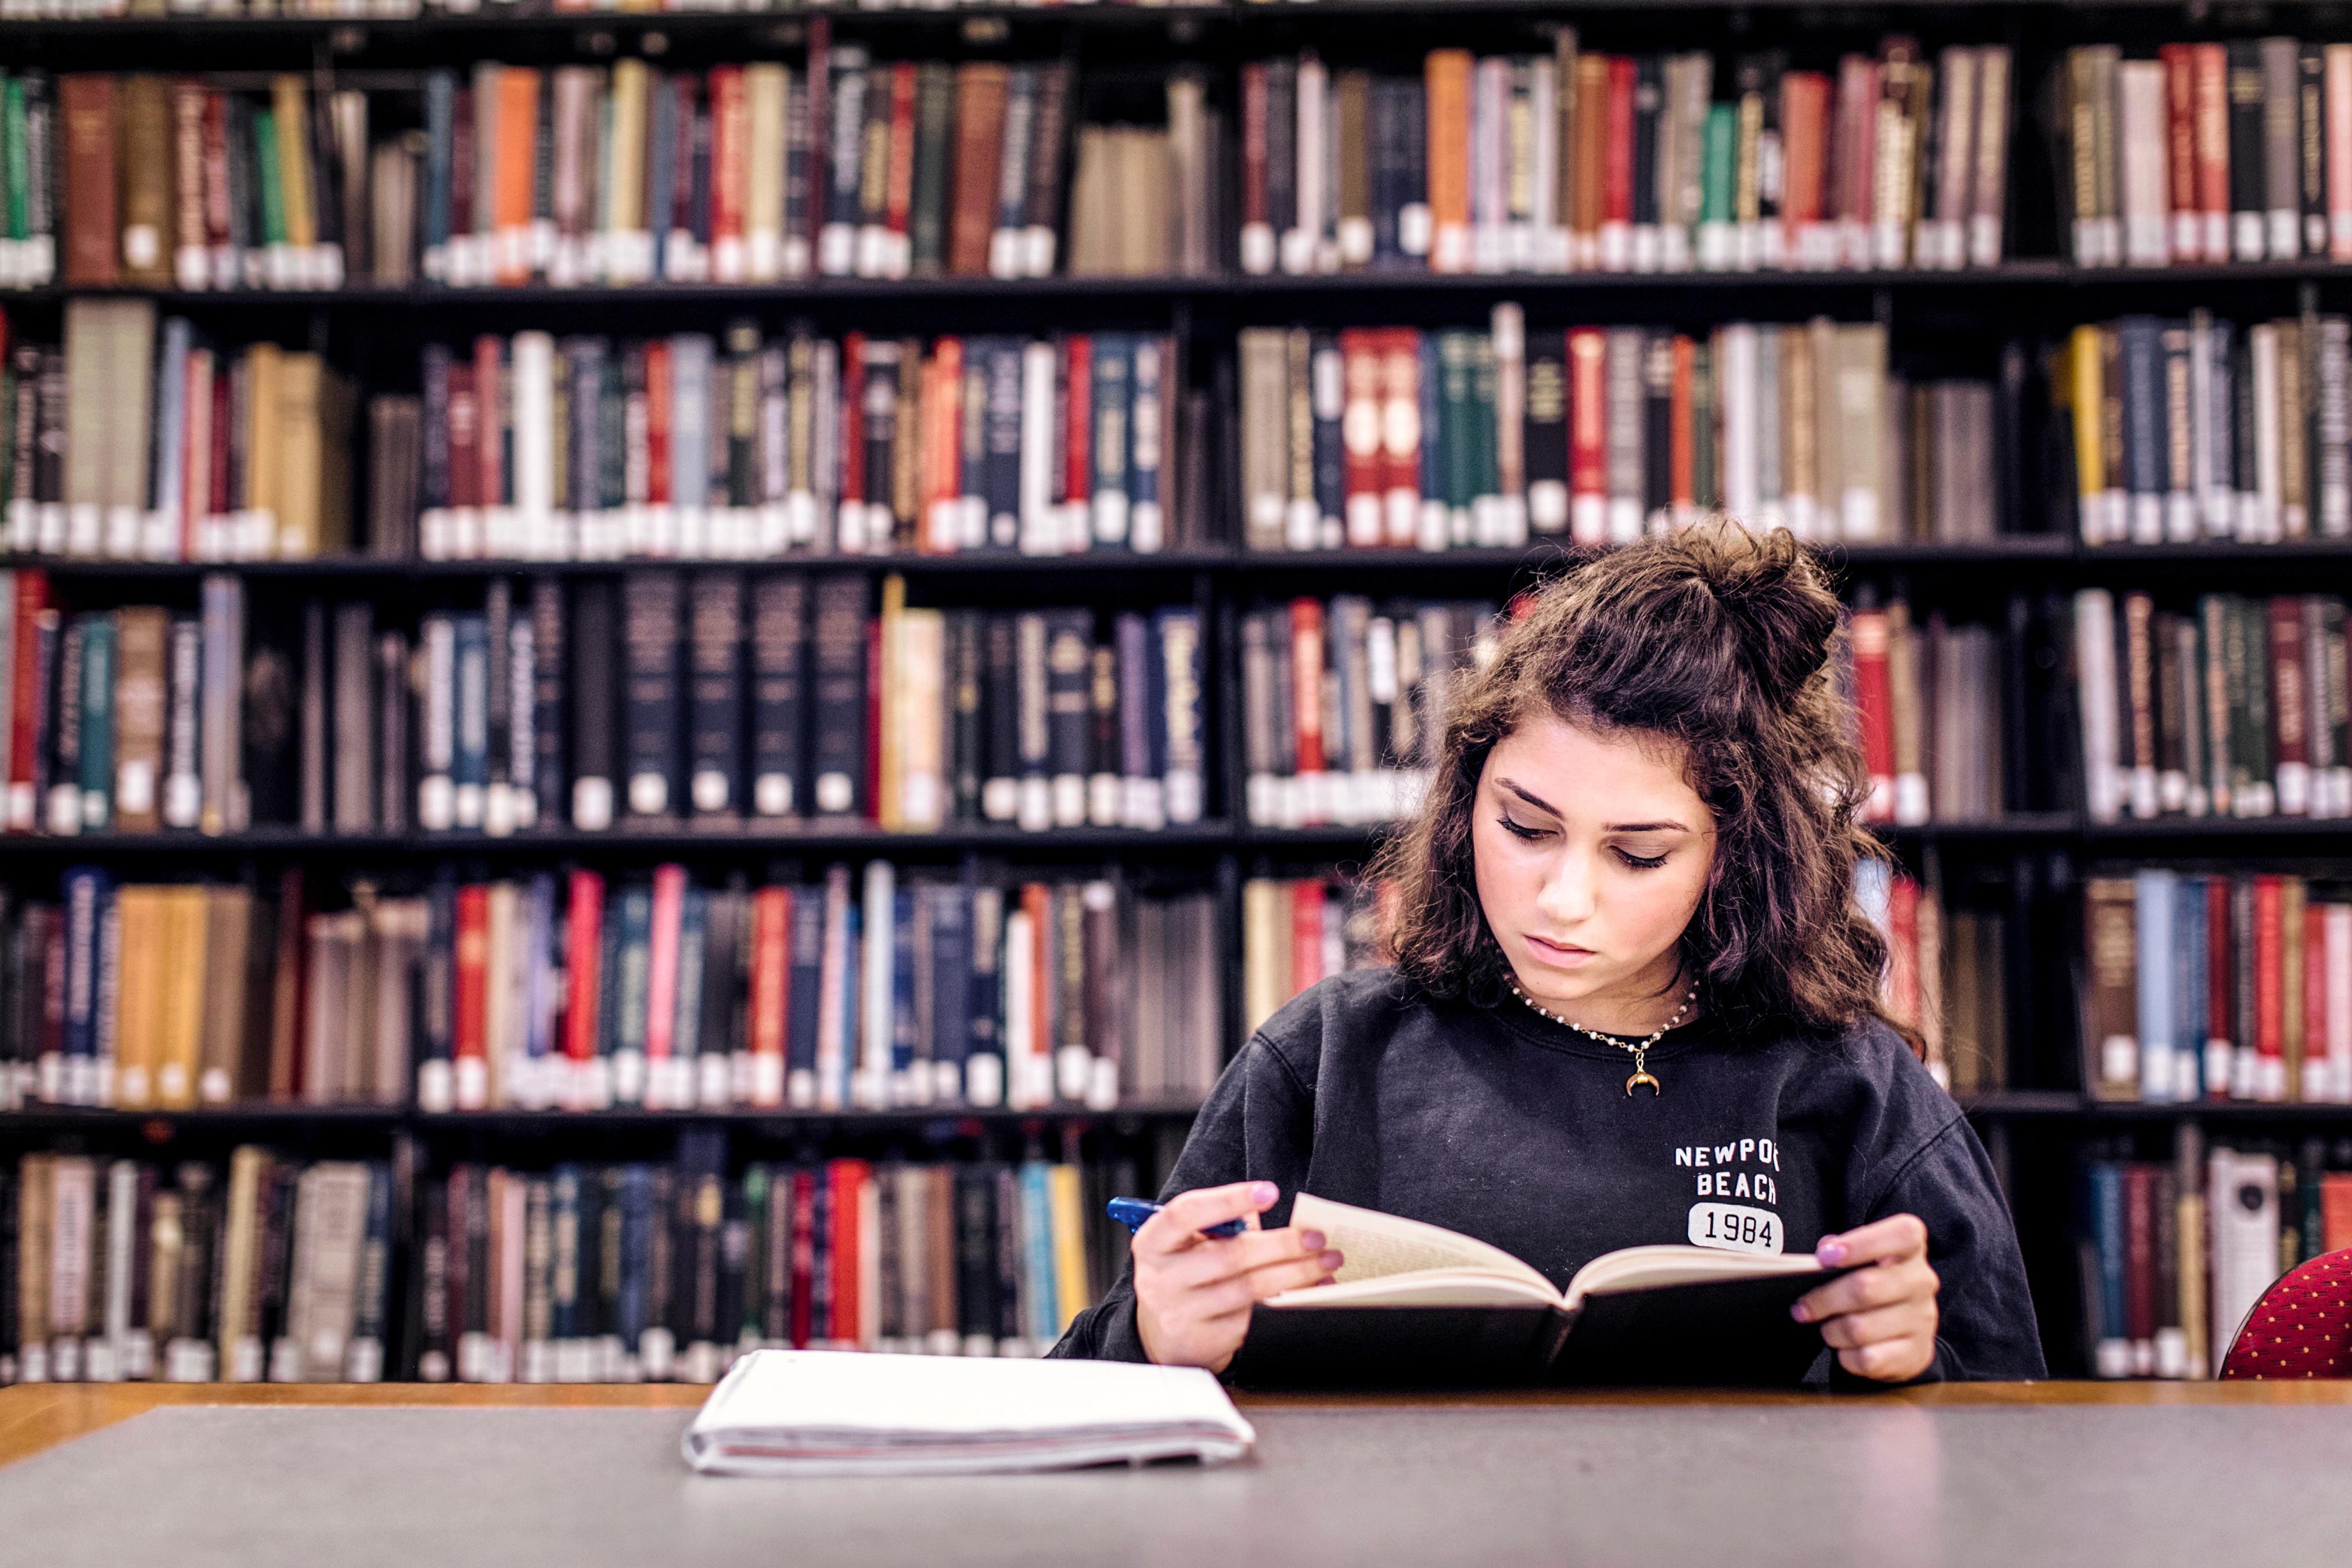 Books-to-Read-1.jpg